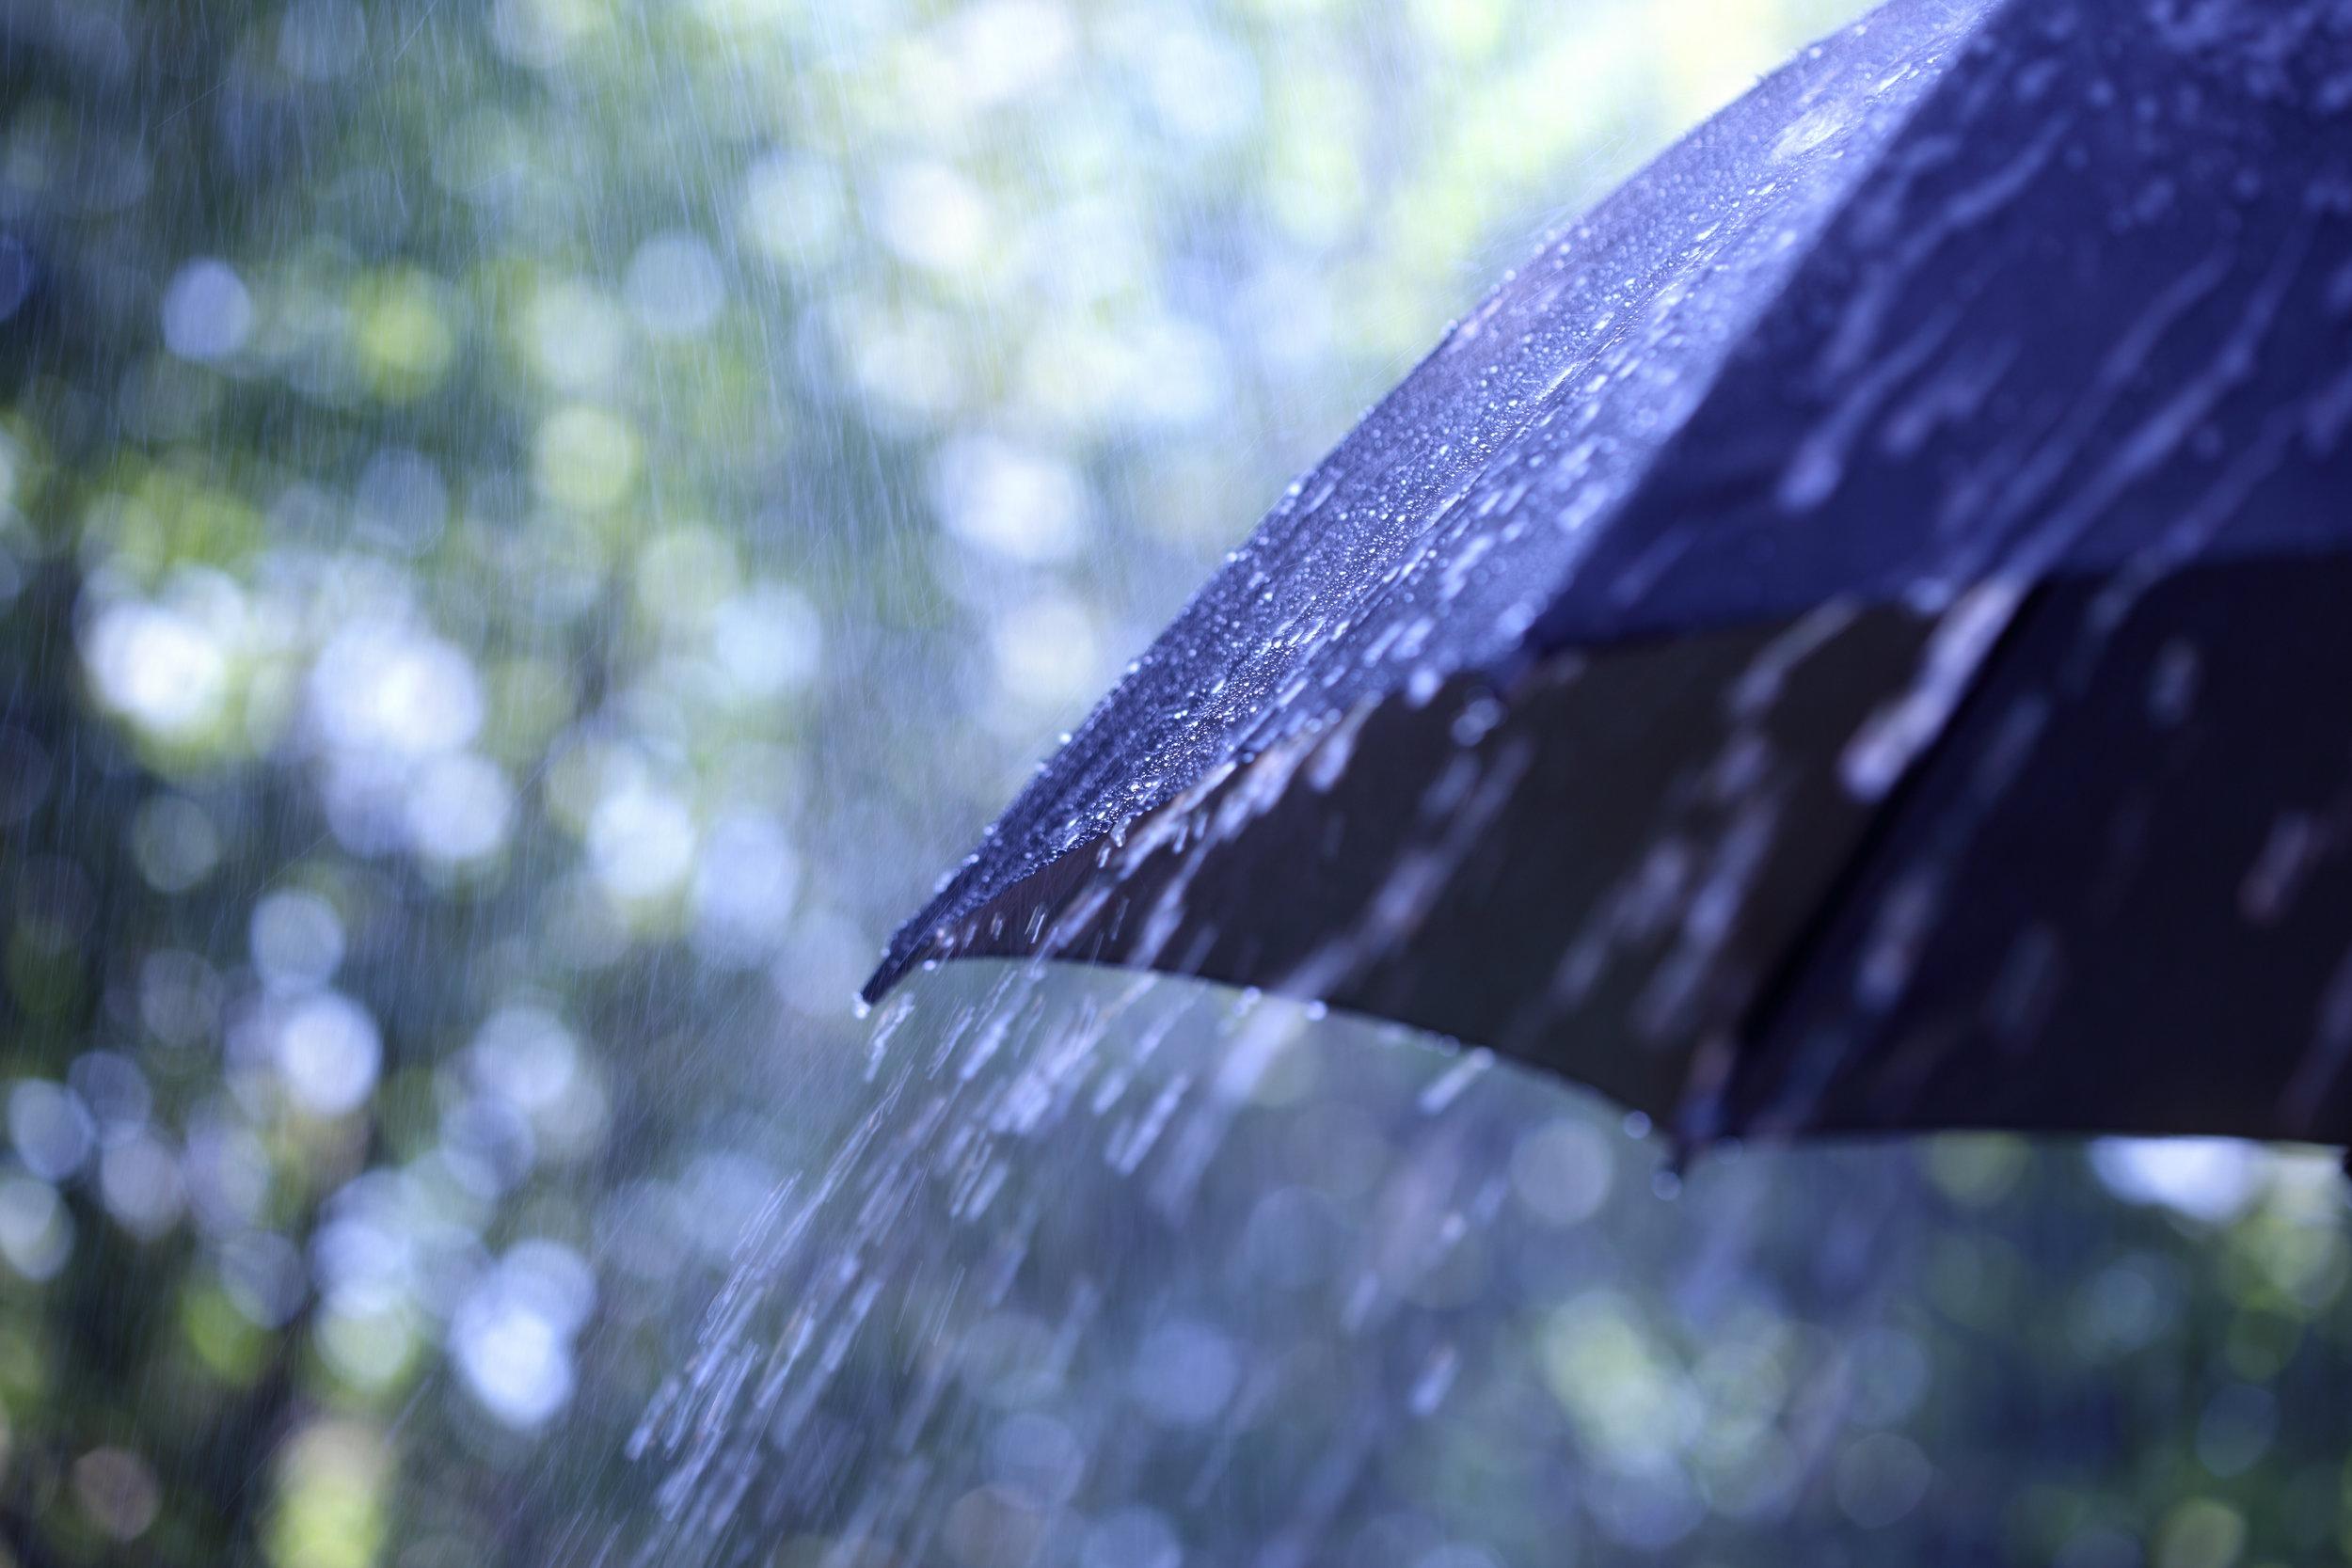 Rain on umbrella-1.jpg